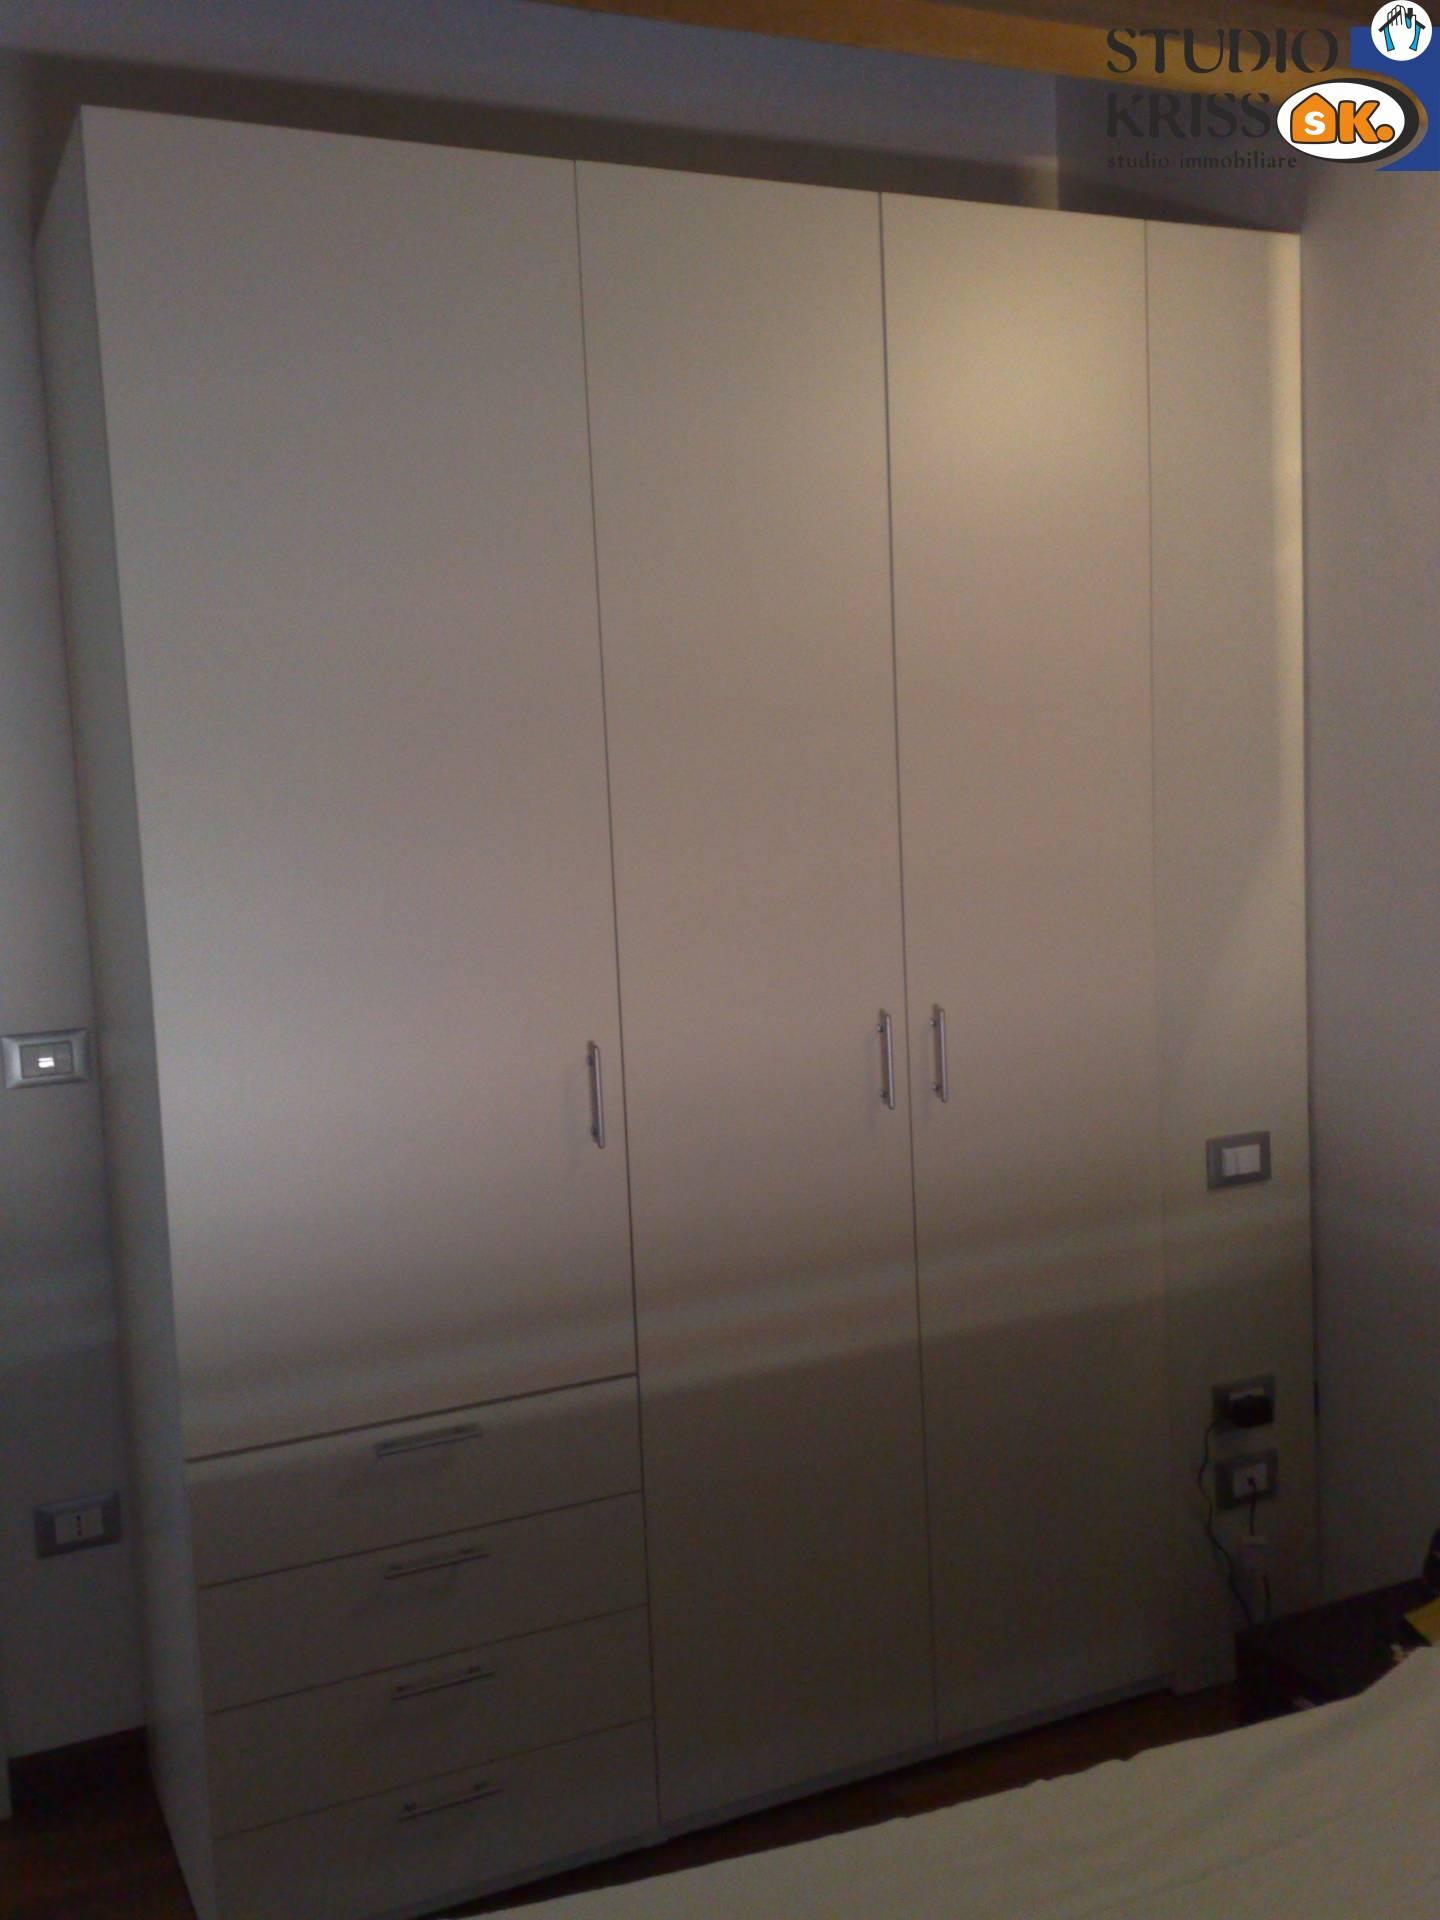 Appartamento in Vendita a Ferrara: 2 locali, 60 mq - Foto 6